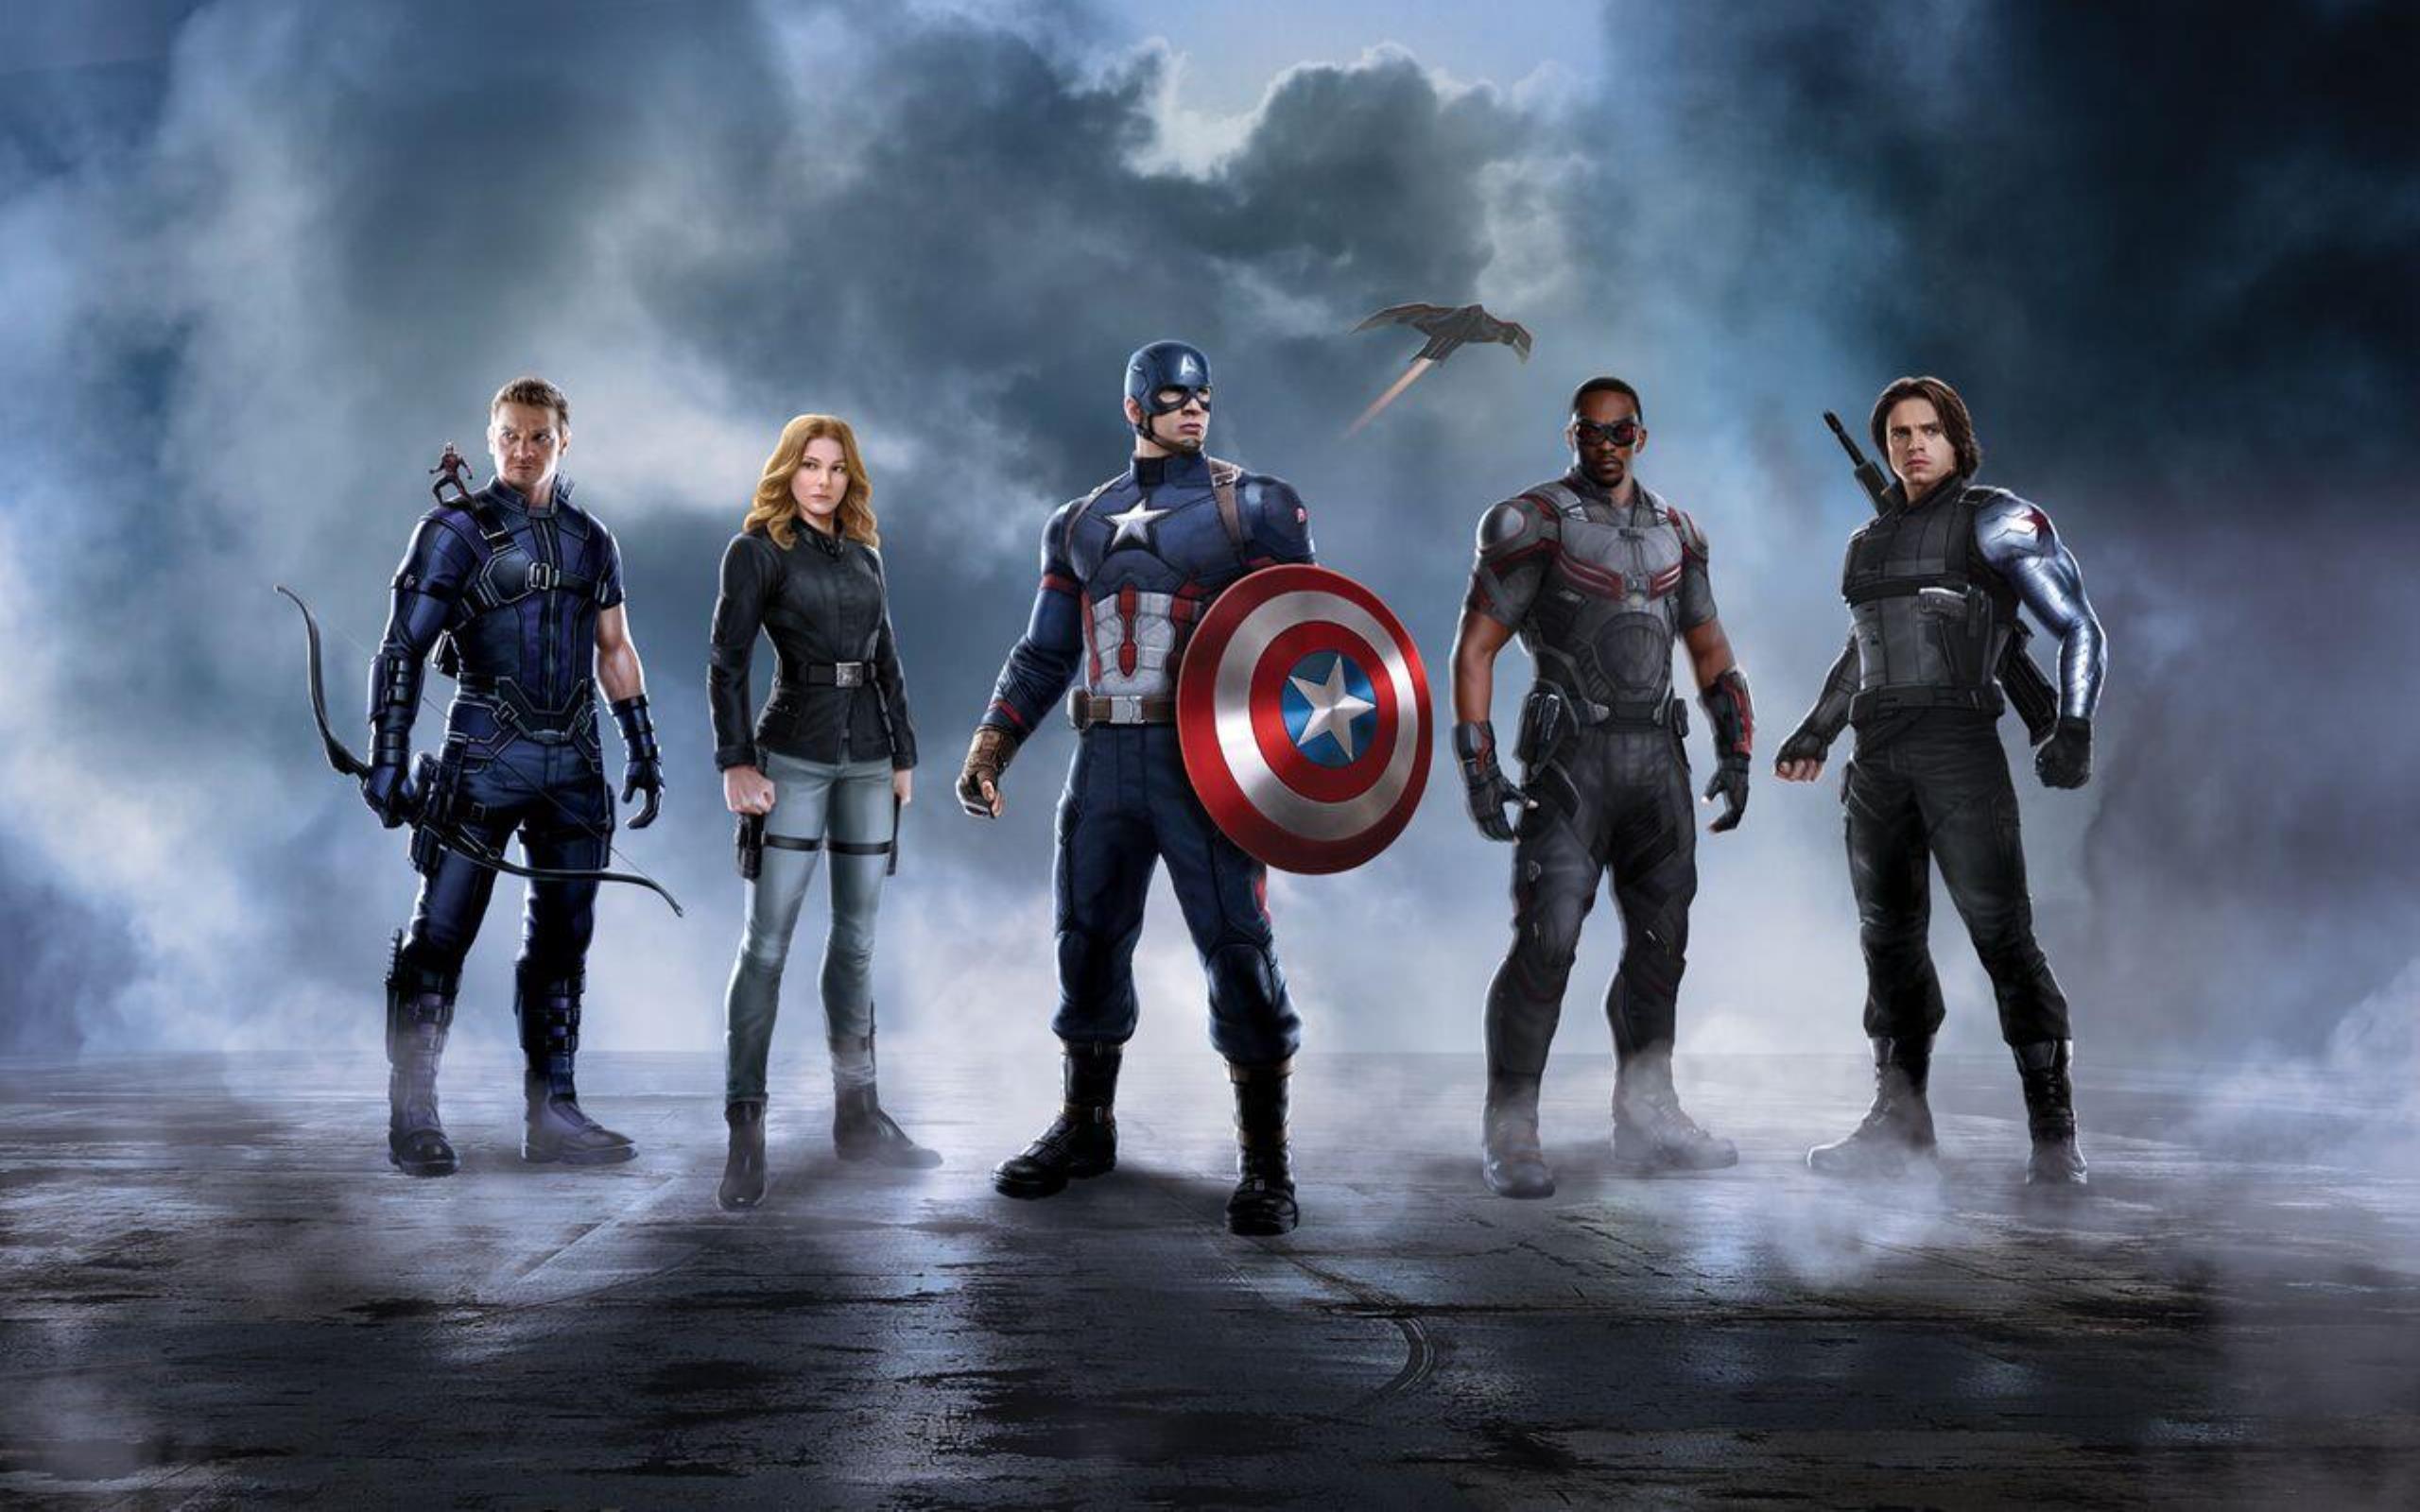 High Resolution Captain America Civil War Computer Wallpaper HD Full 2560x1600